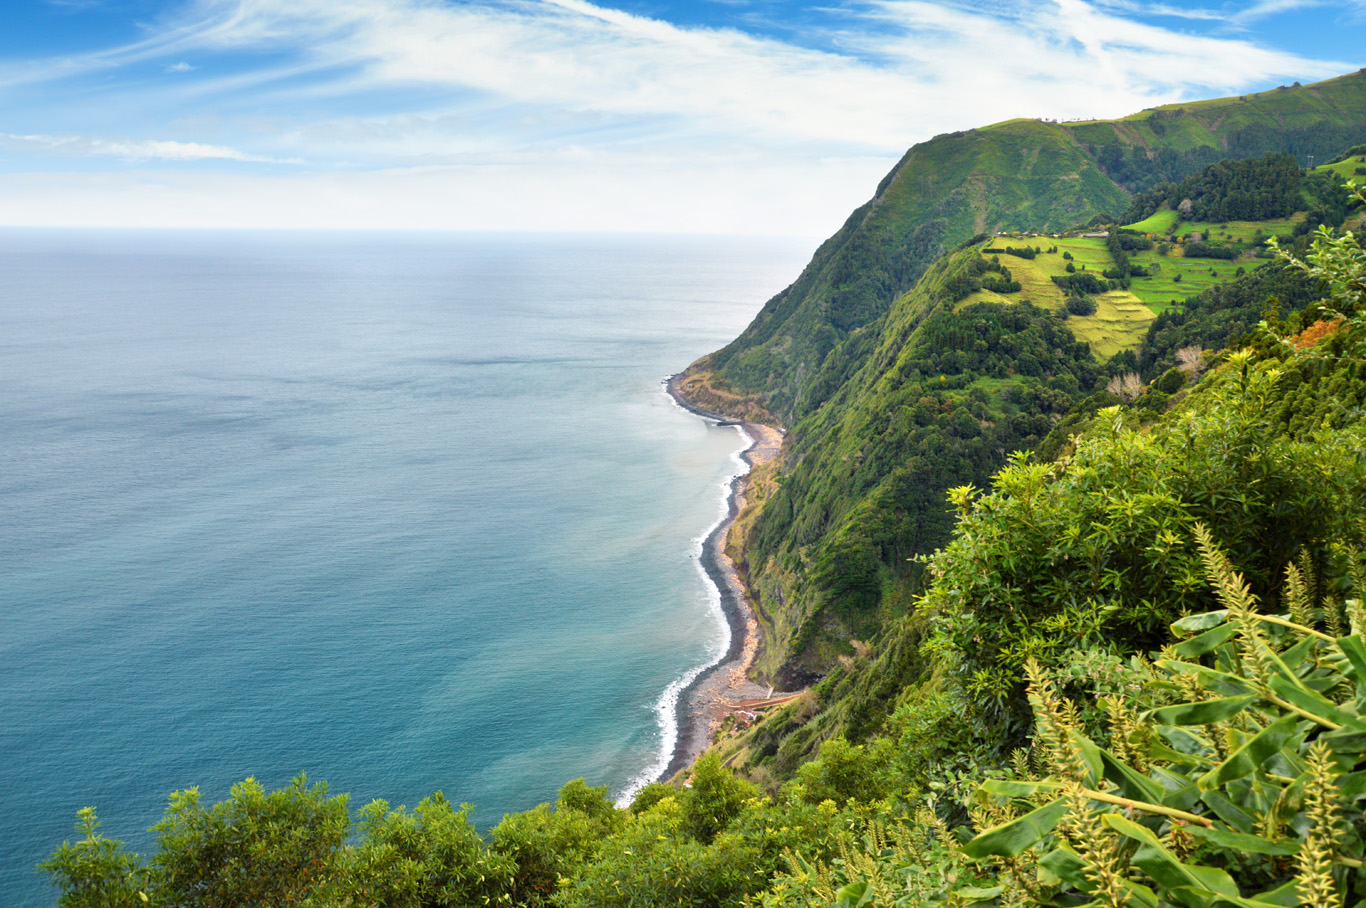 View from the miradouro da Ponta do Sossego